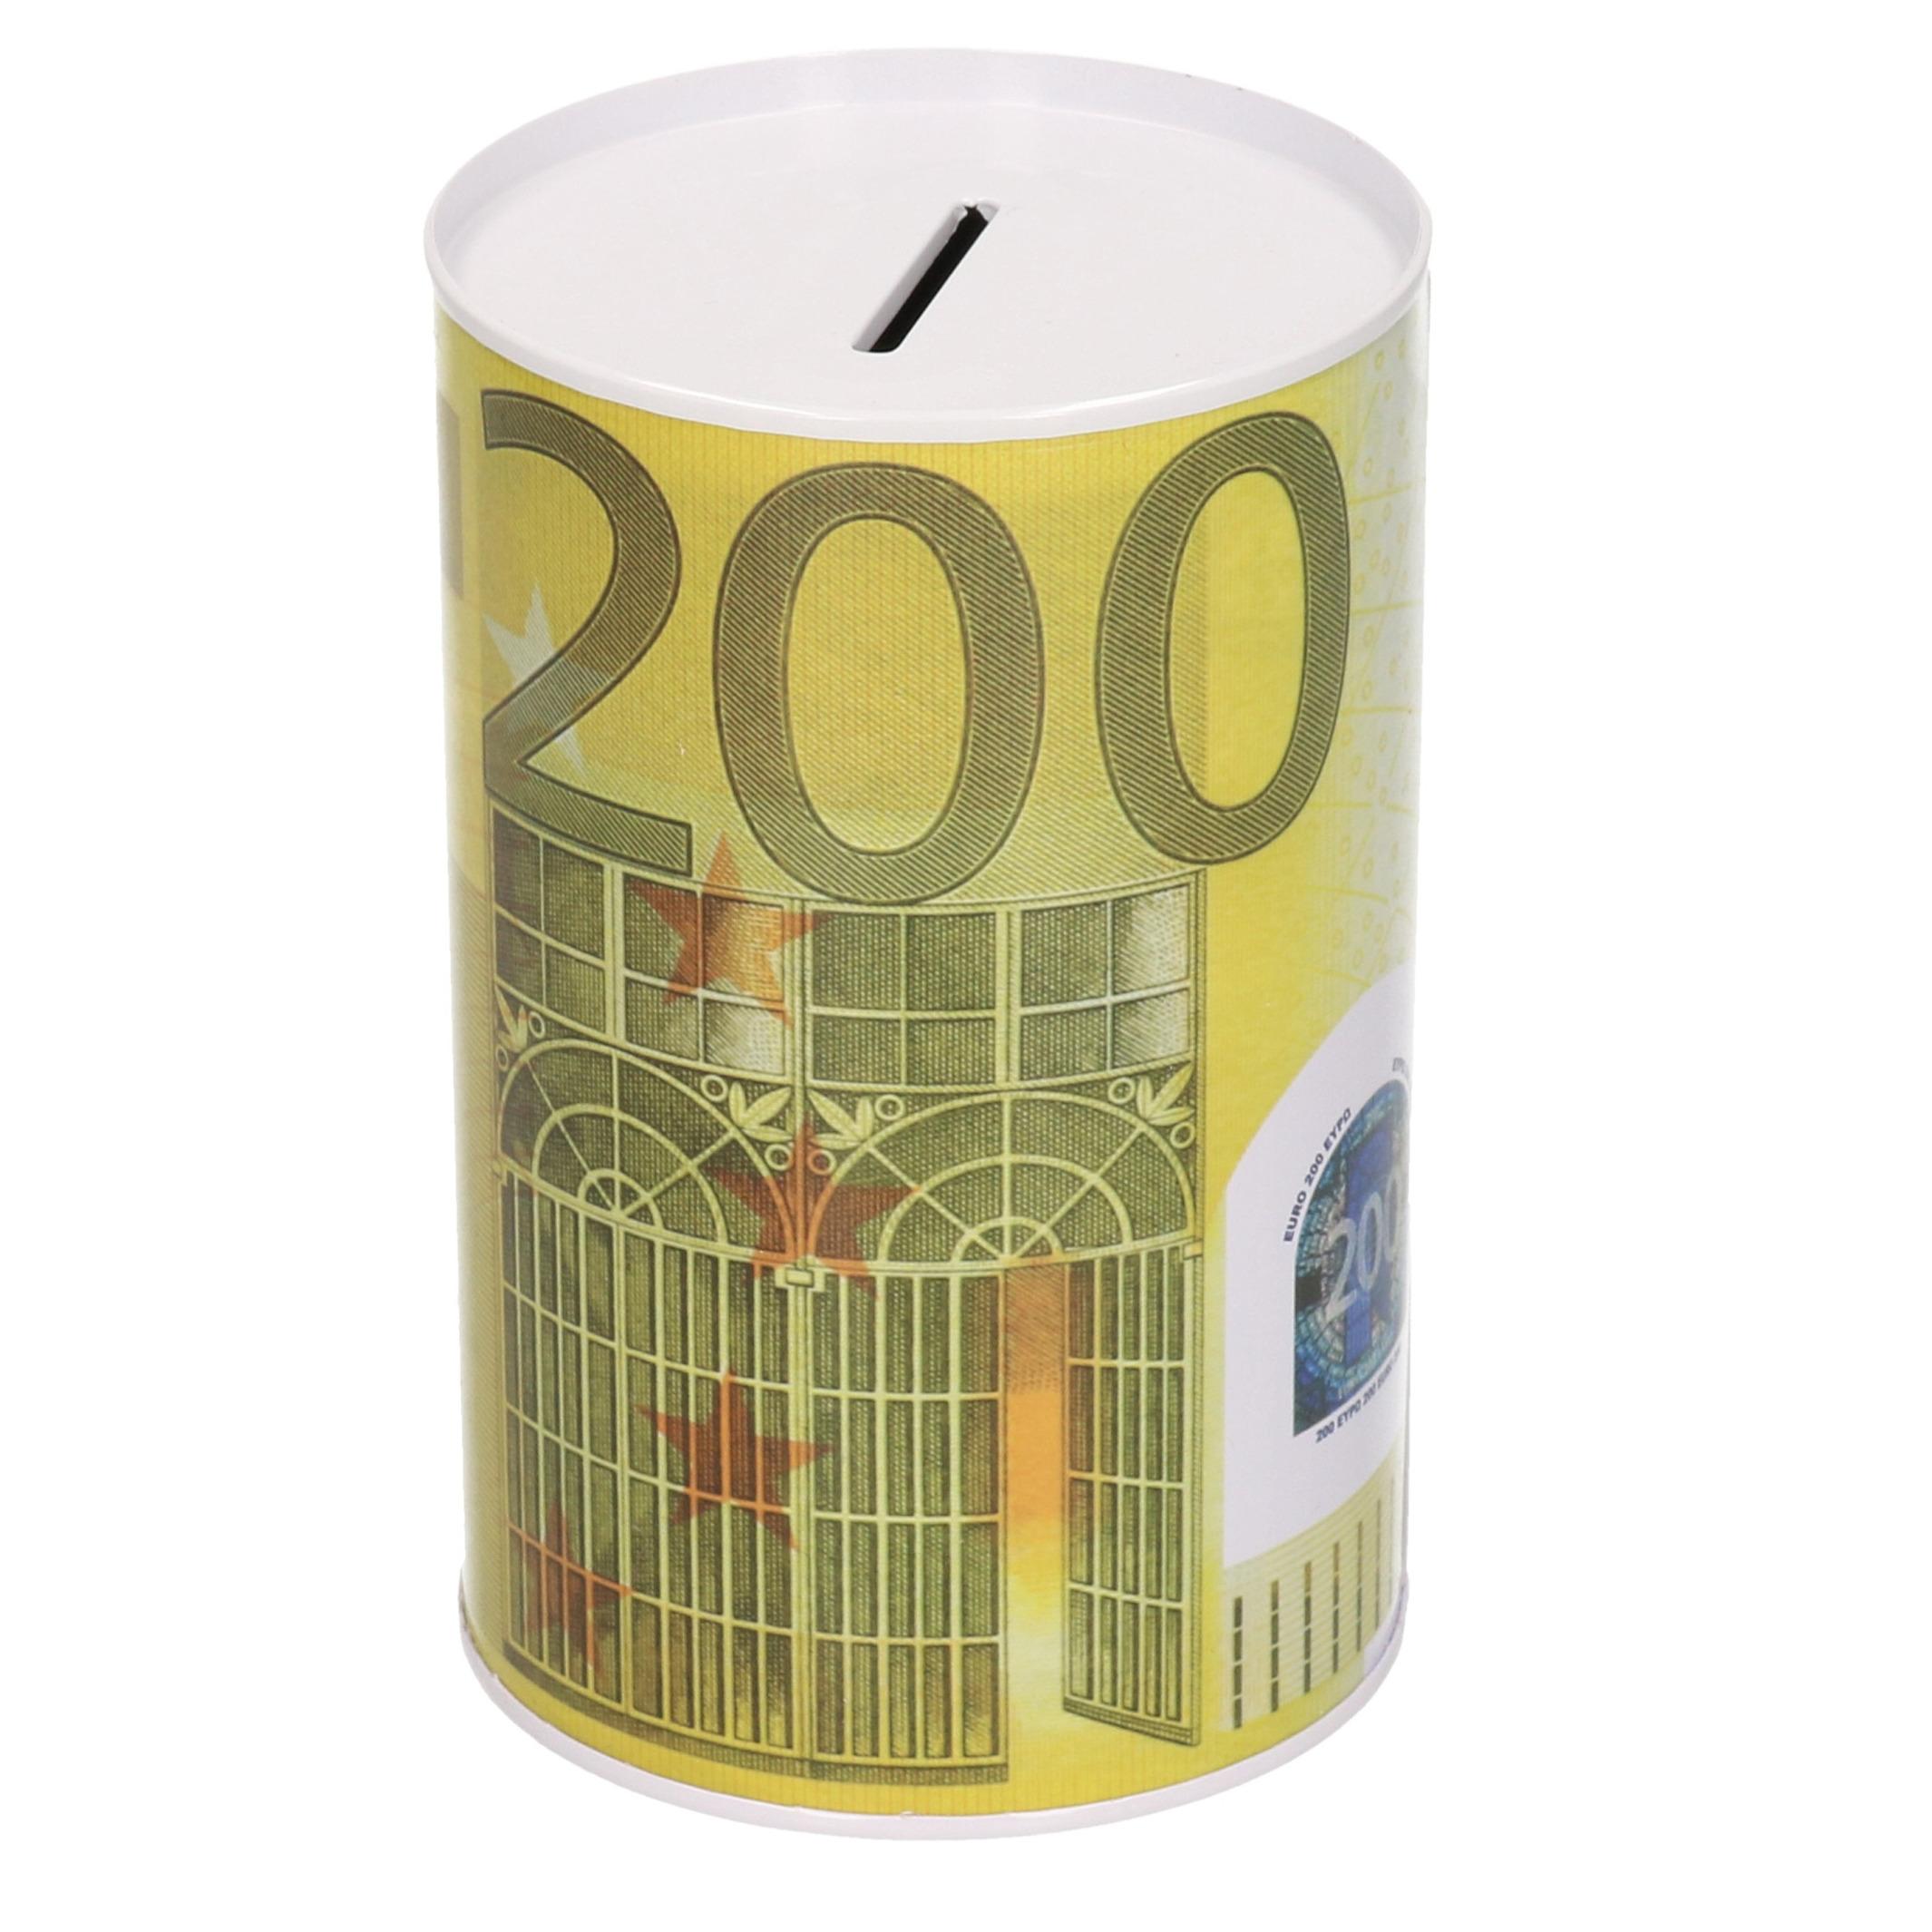 Spaarpot blik 200 euro biljet 8 x 15 cm